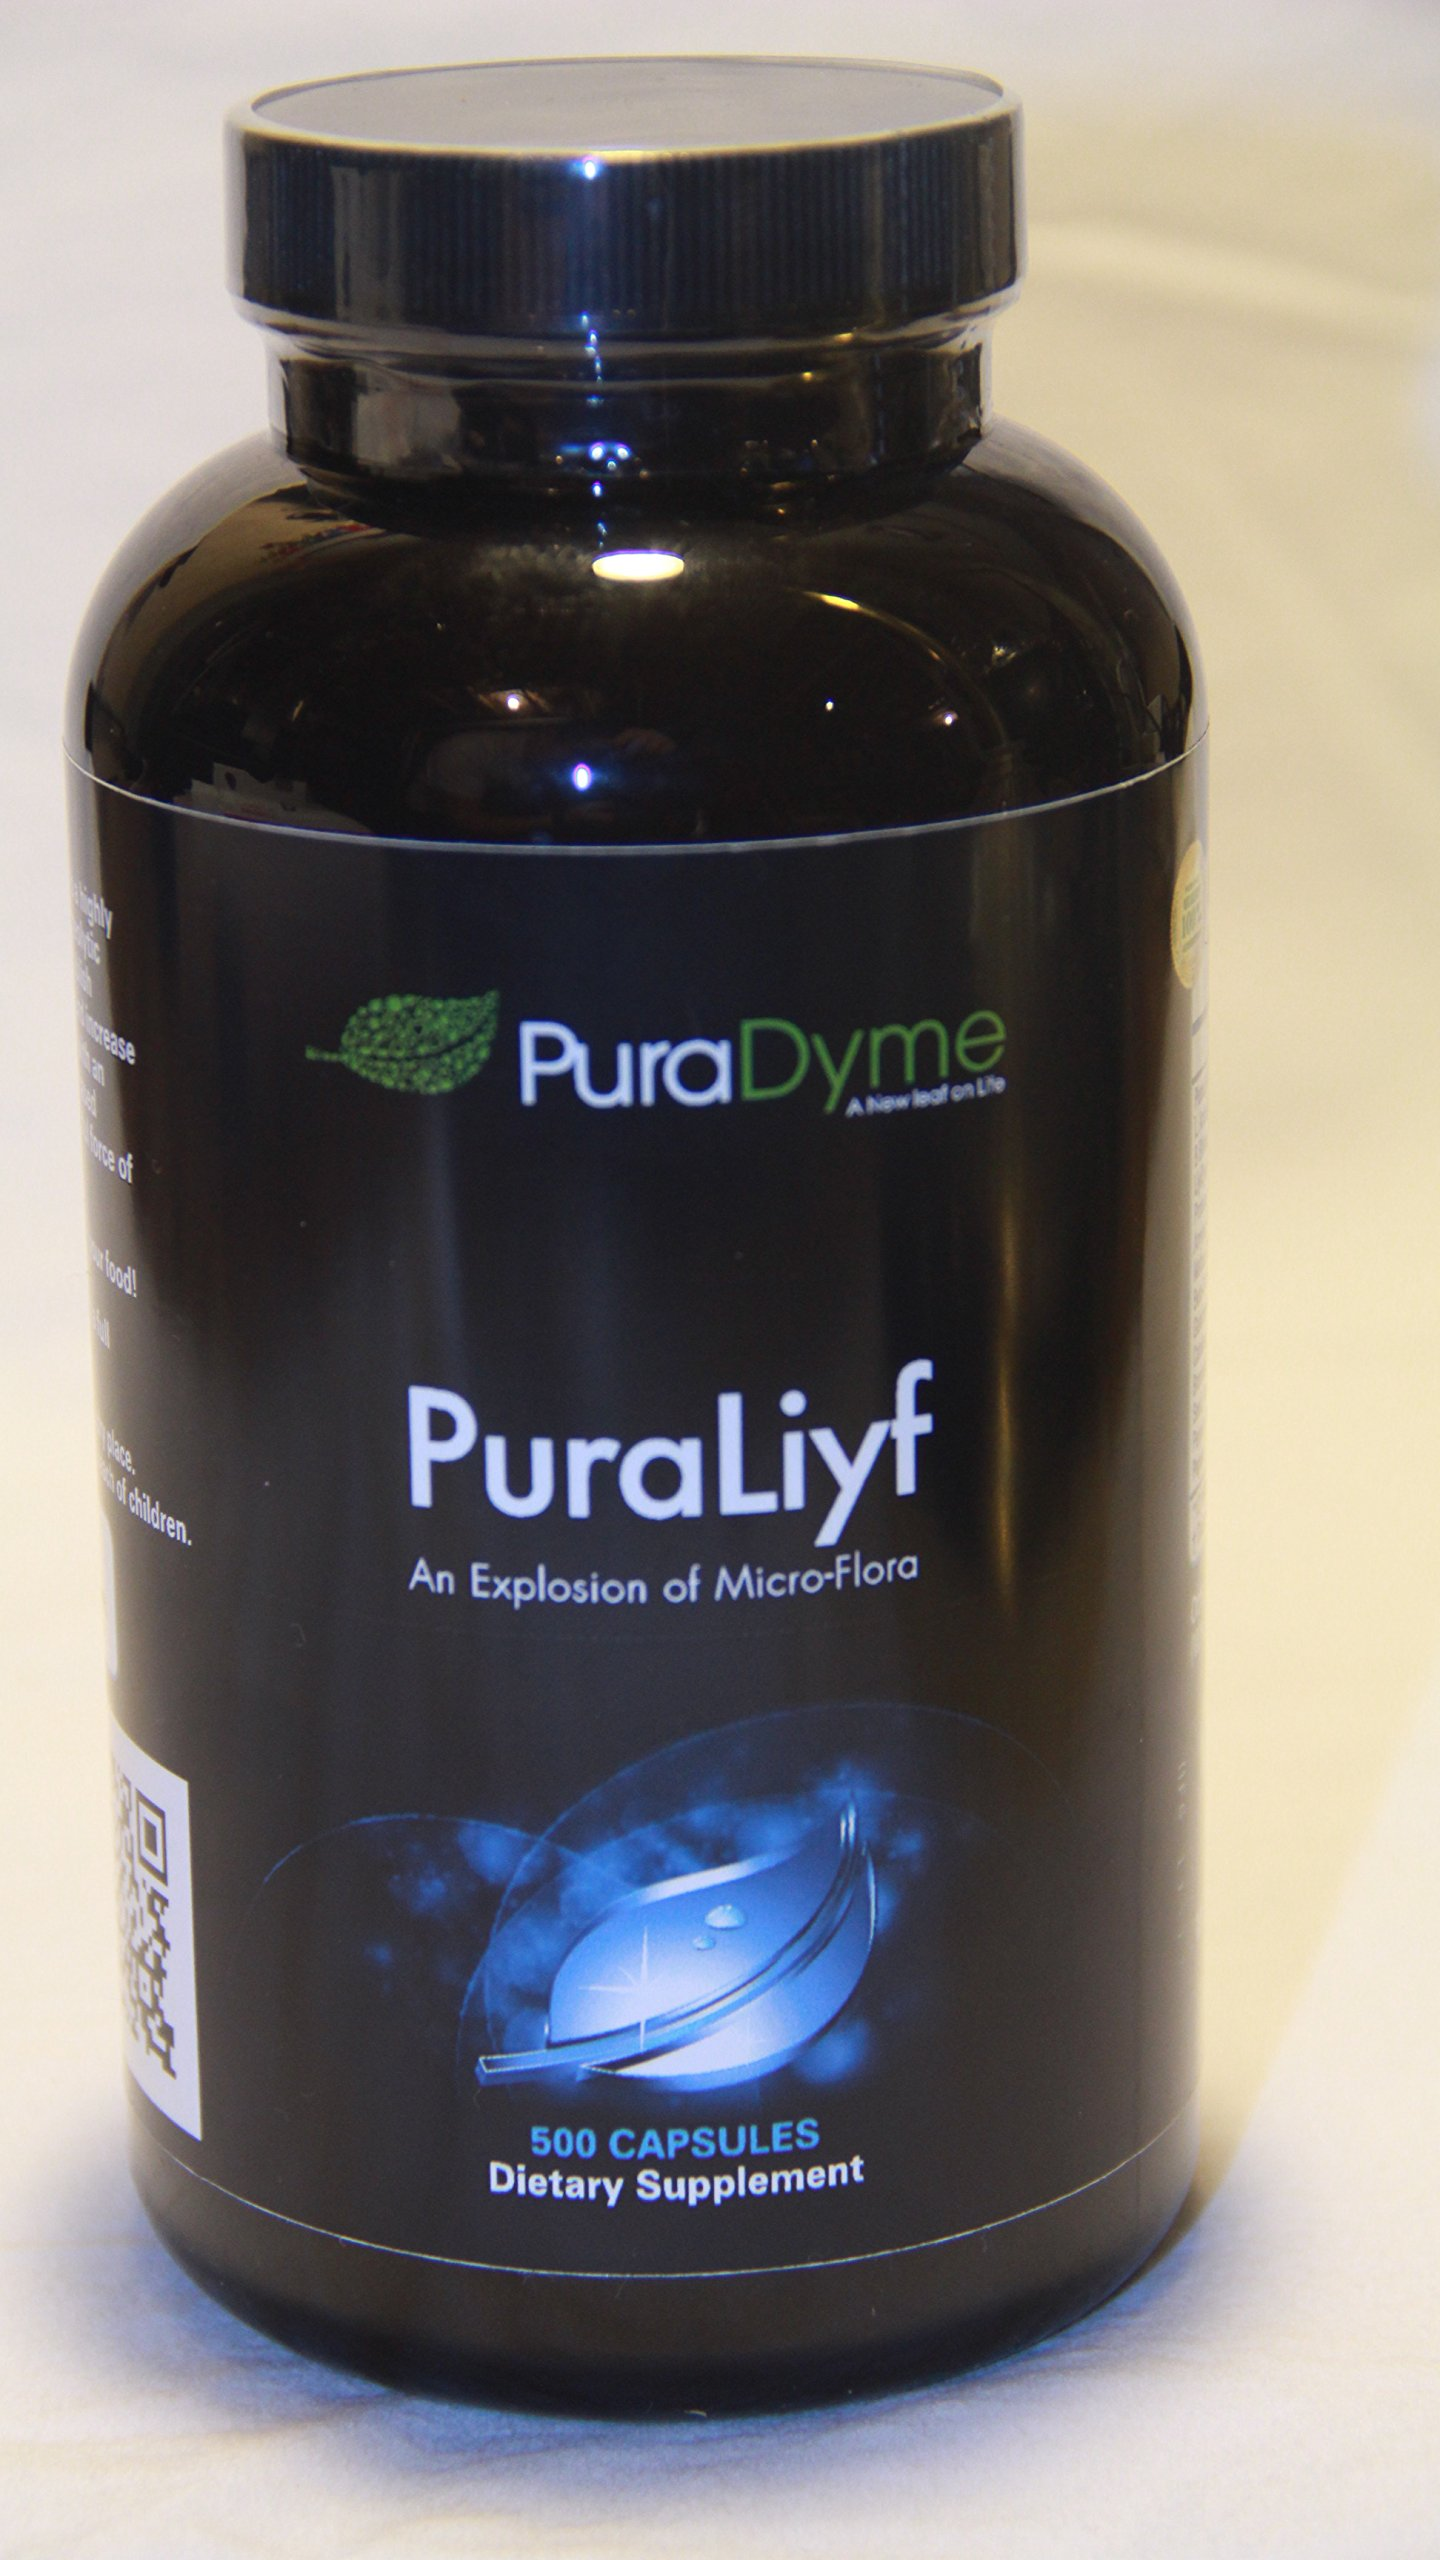 PuraLiyf 500 veggie capsules By Lou Corona